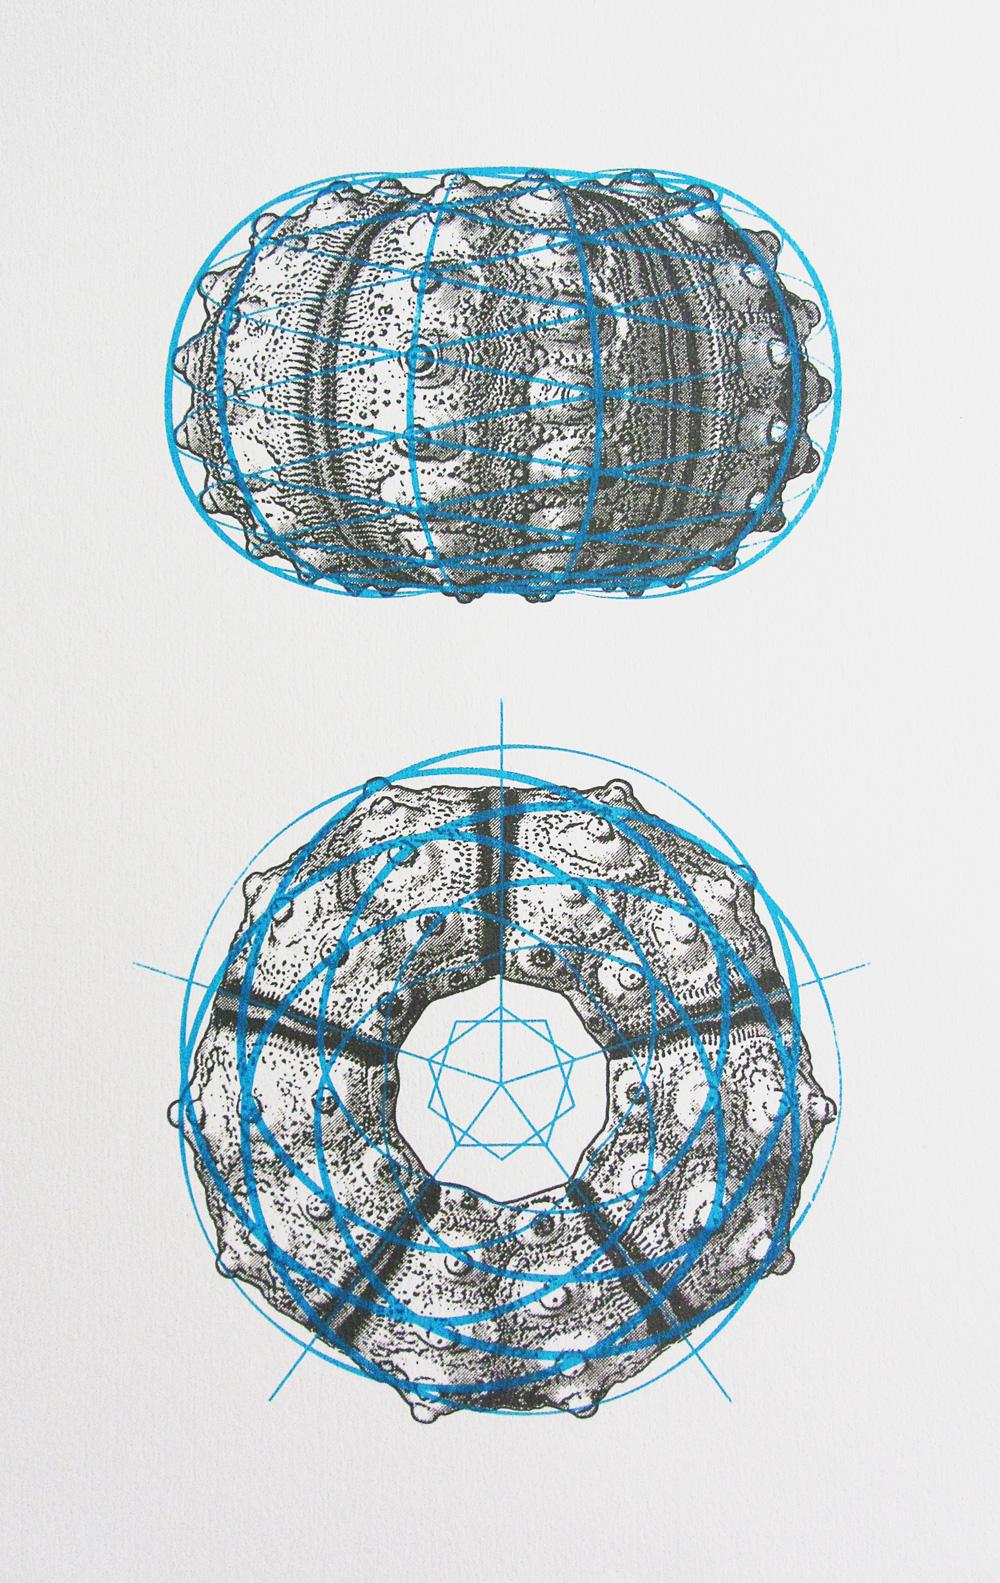 urchin spirals screen print by ameet hindocha ambigraph